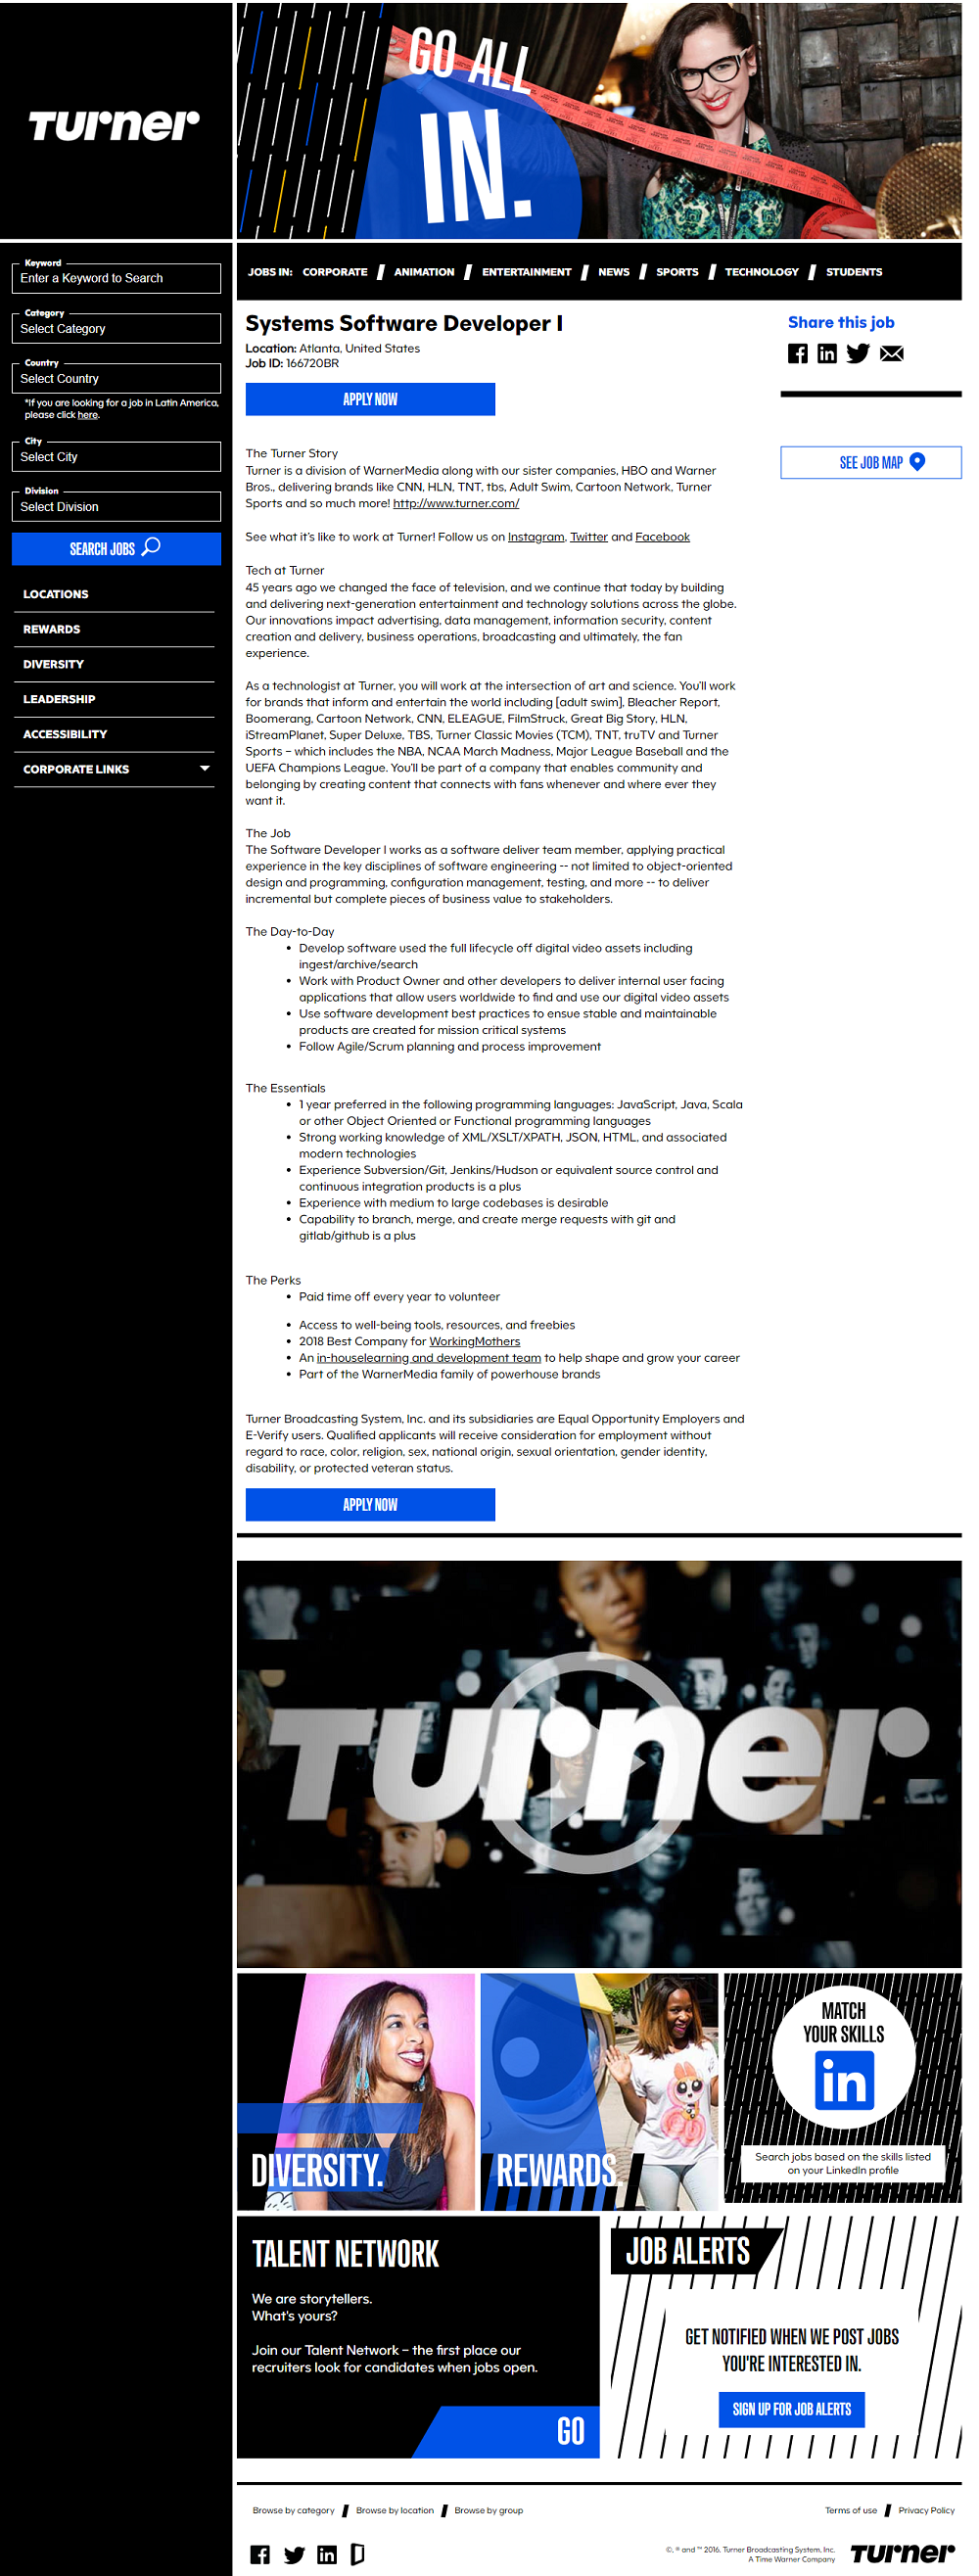 Turner job description